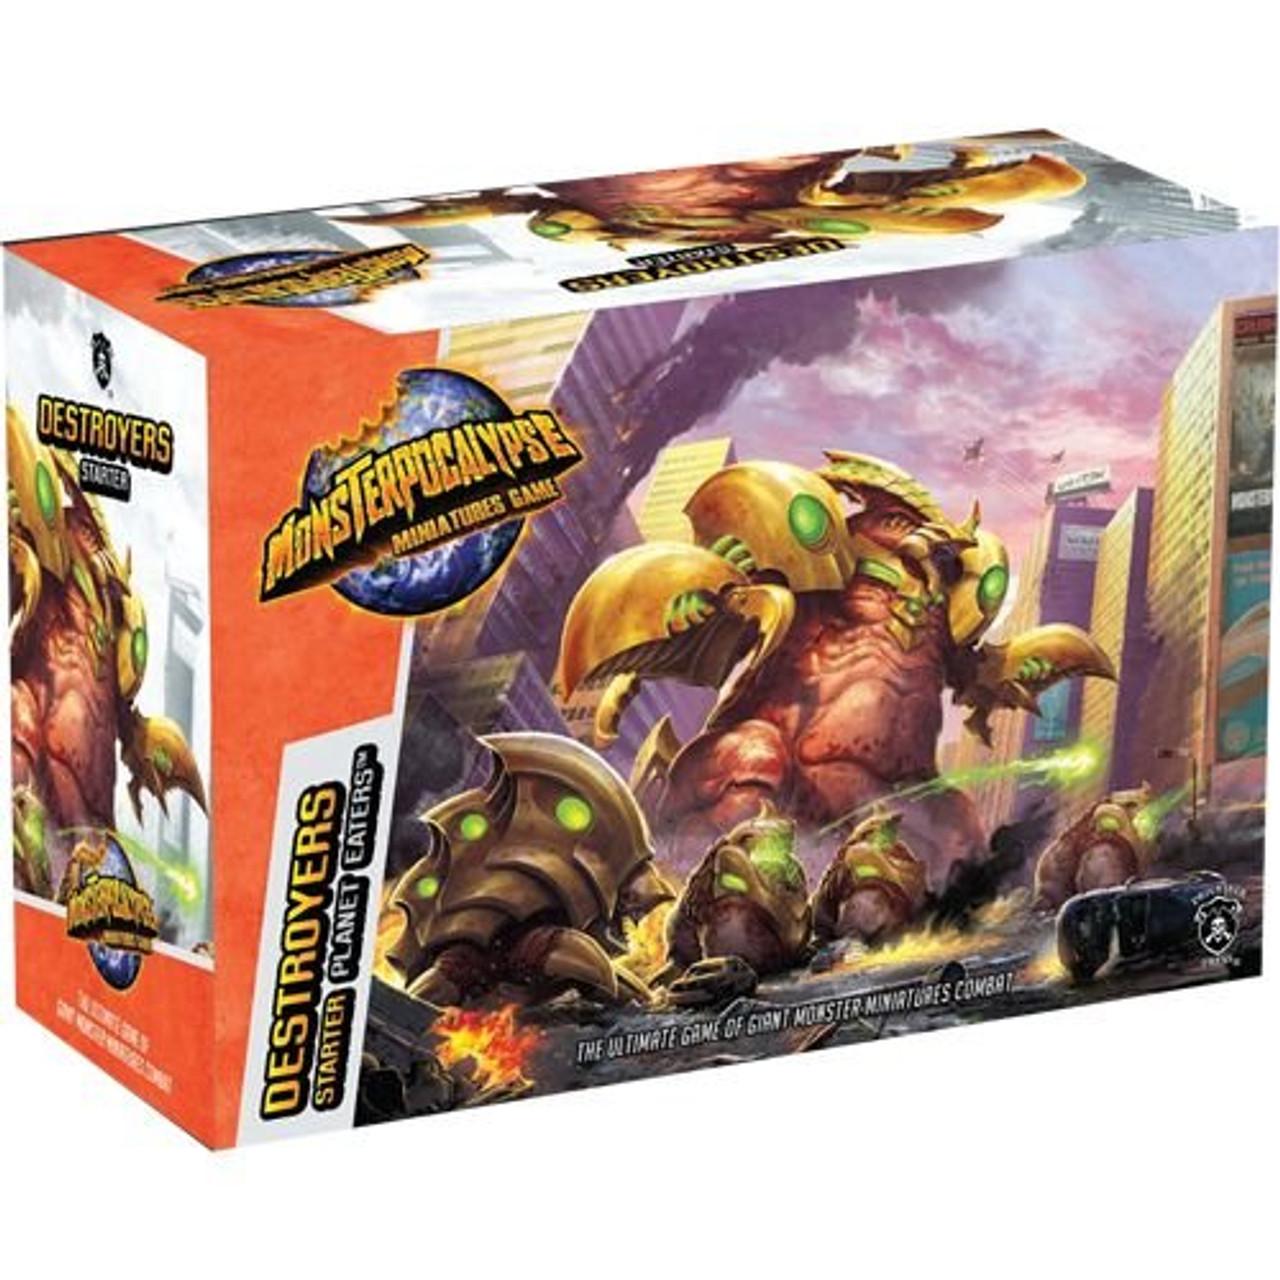 Monsterpocalypse Starter - Destroyers